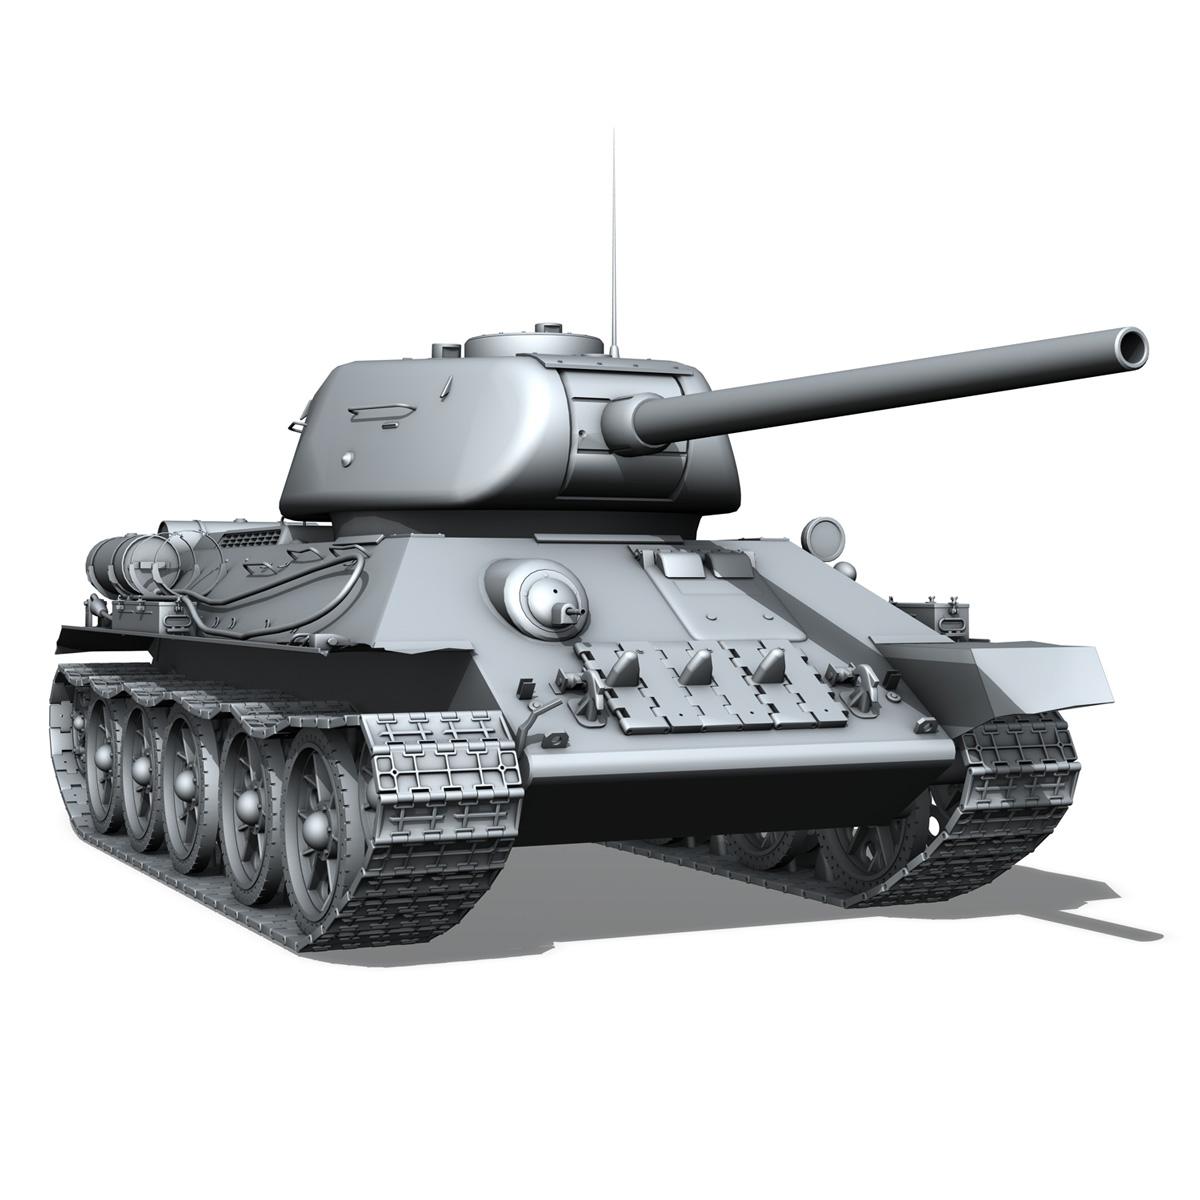 t-34 85 – soviet medium tank 3d model 3ds fbx lwo lw lws obj c4d 266415